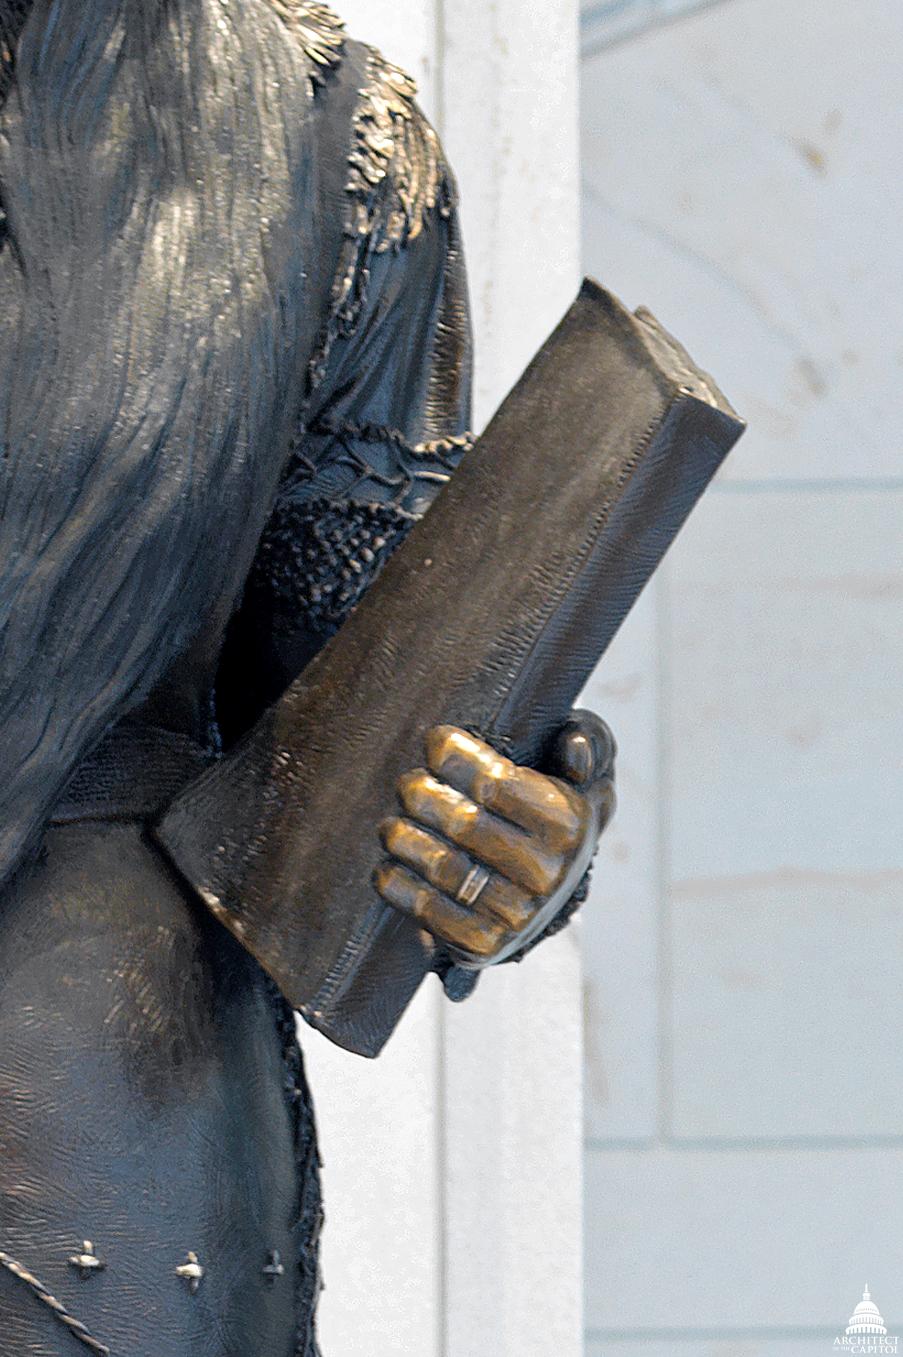 Detail of the book of Sarah Winnemucca's statue.